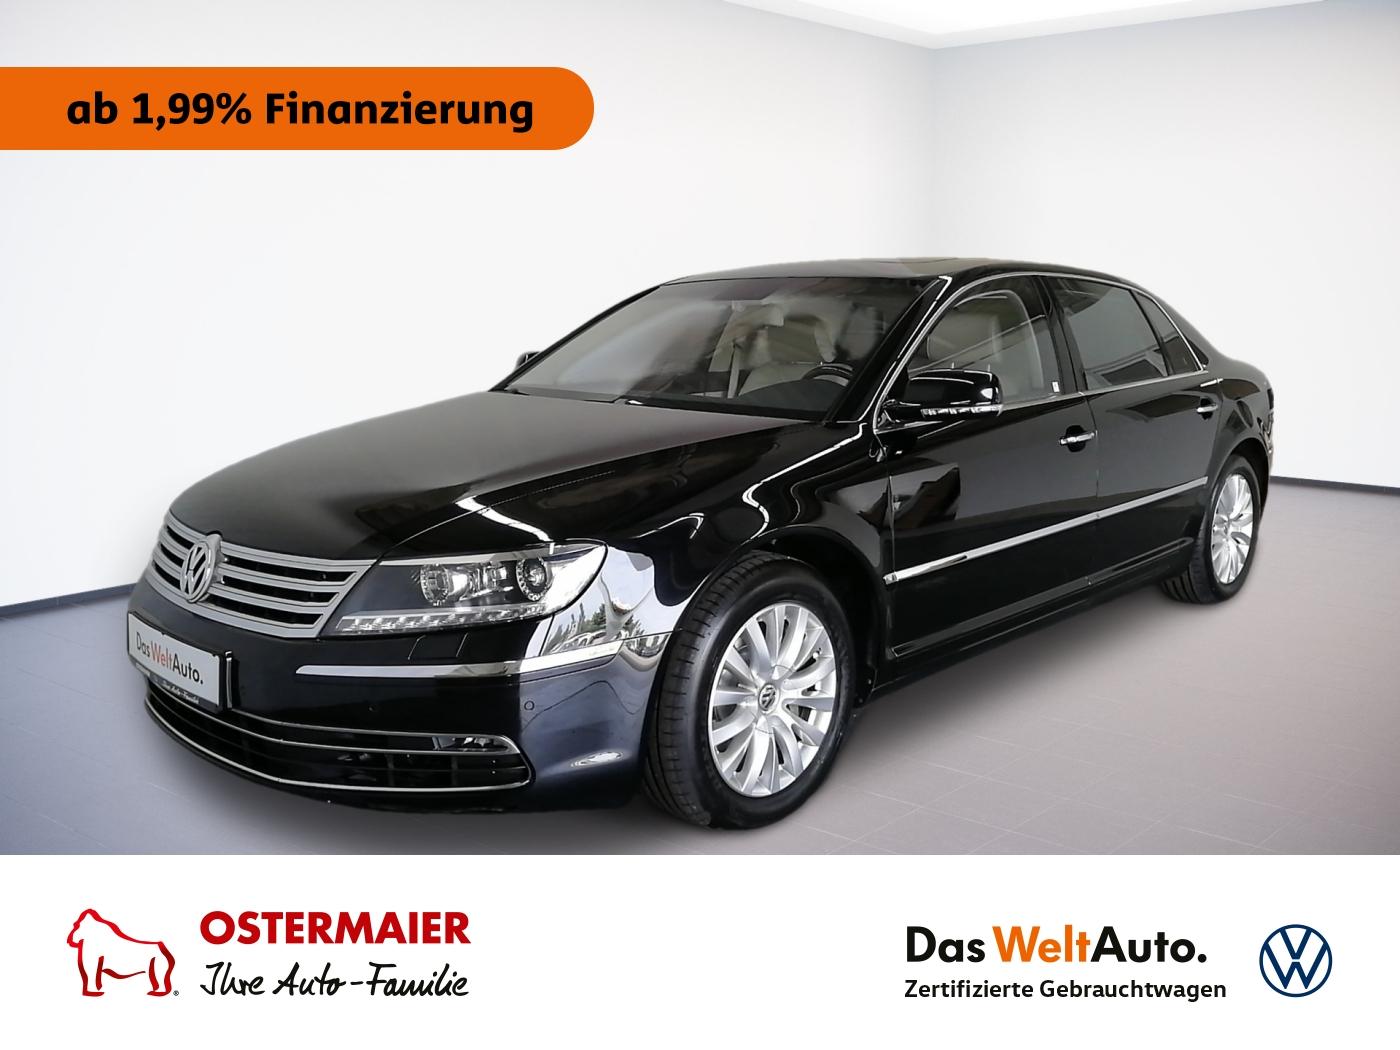 Volkswagen Phaeton lang 3.0TDI 245PS DSG 4M LUFT.KAMERA.NAV, Jahr 2015, Diesel